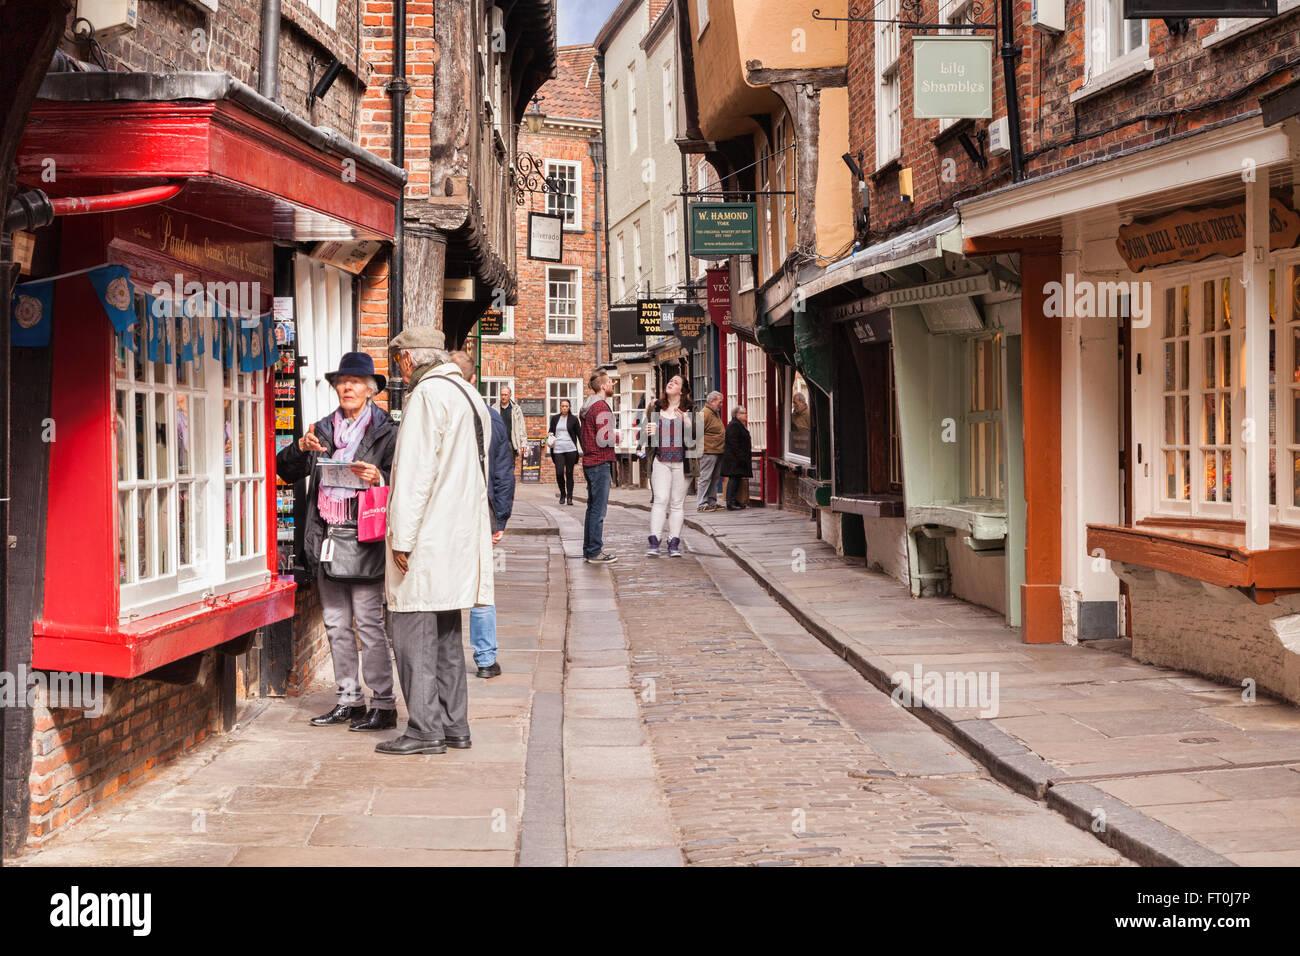 Senior couple shopping dans la pagaille, York, North Yorkshire, Angleterre, Royaume-Uni Léger flou au visage Photo Stock